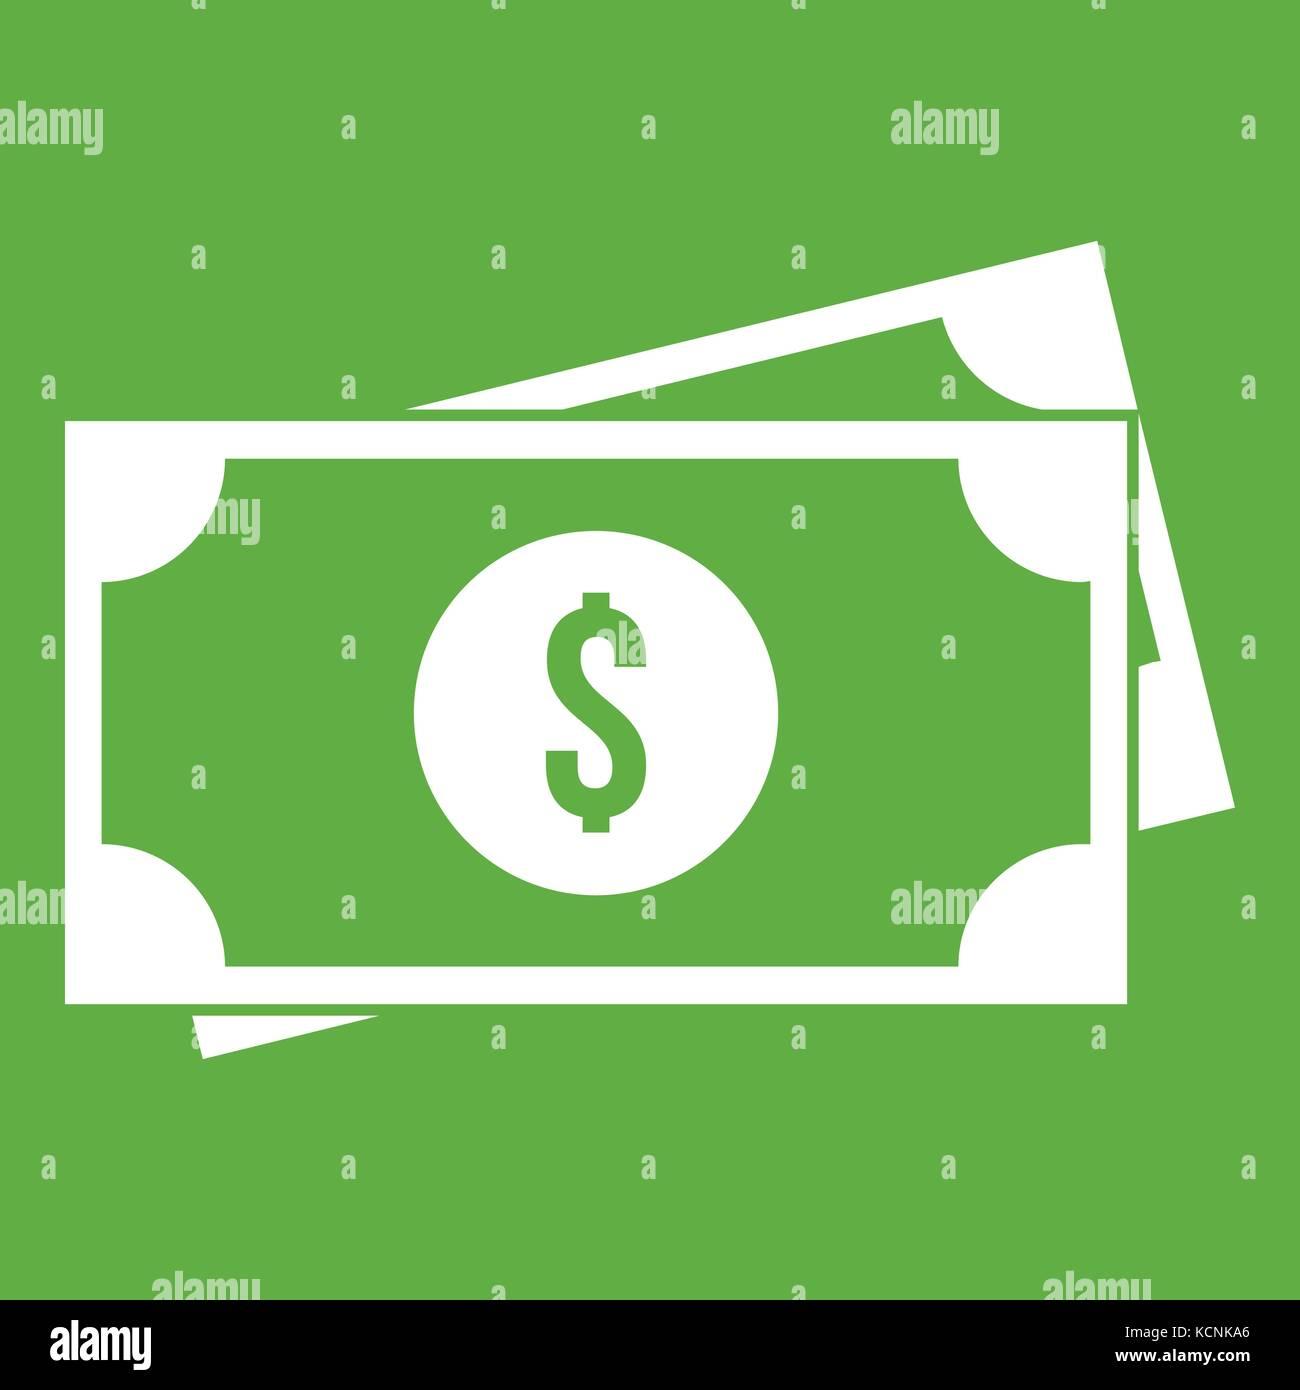 American dollars icon green stock vector art illustration american dollars icon green biocorpaavc